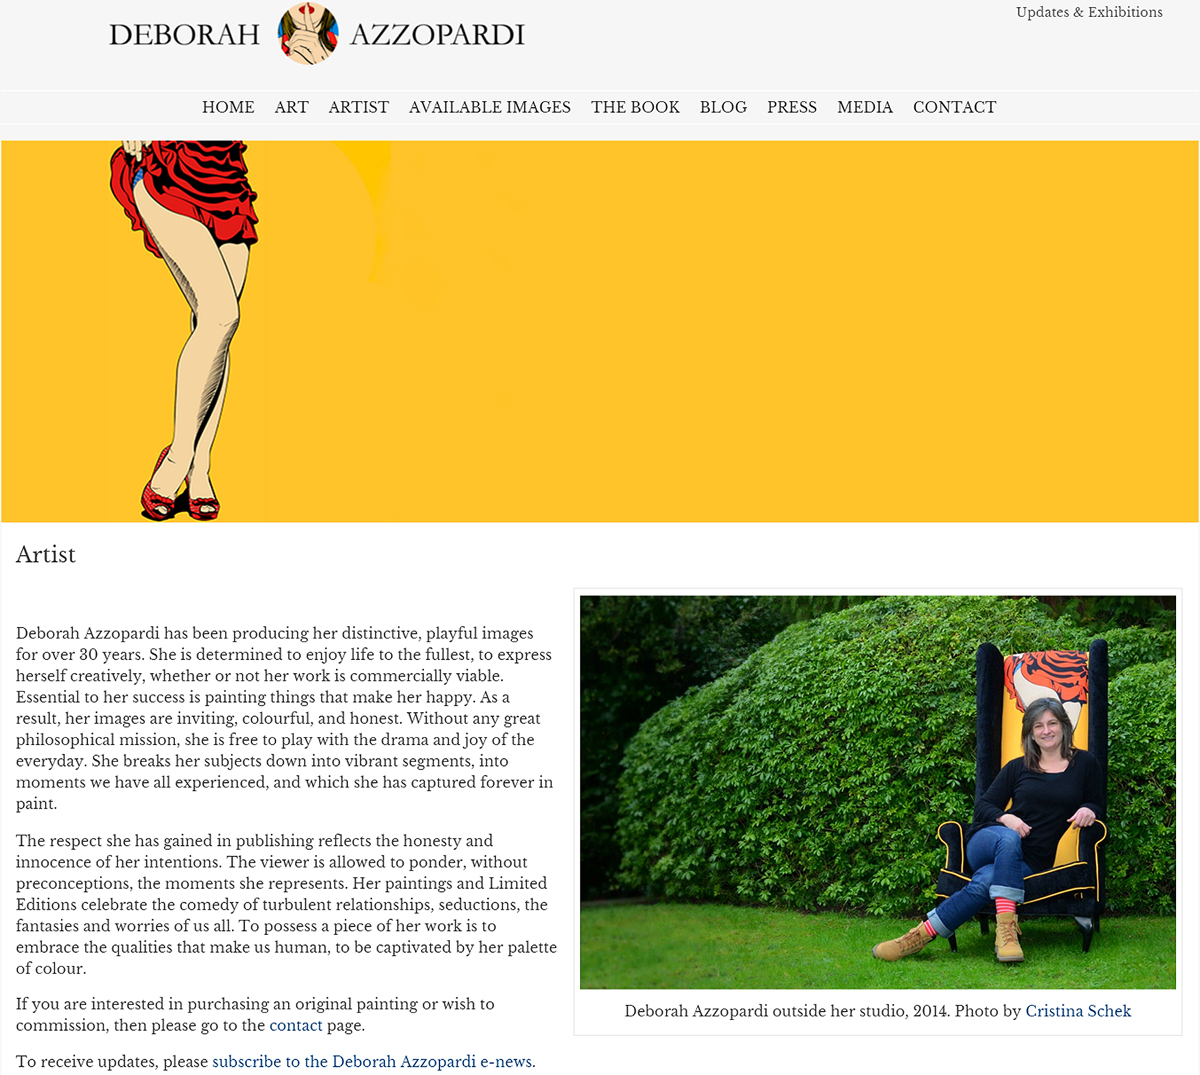 Deborah Azzopardi, website photography by Cristina Schek